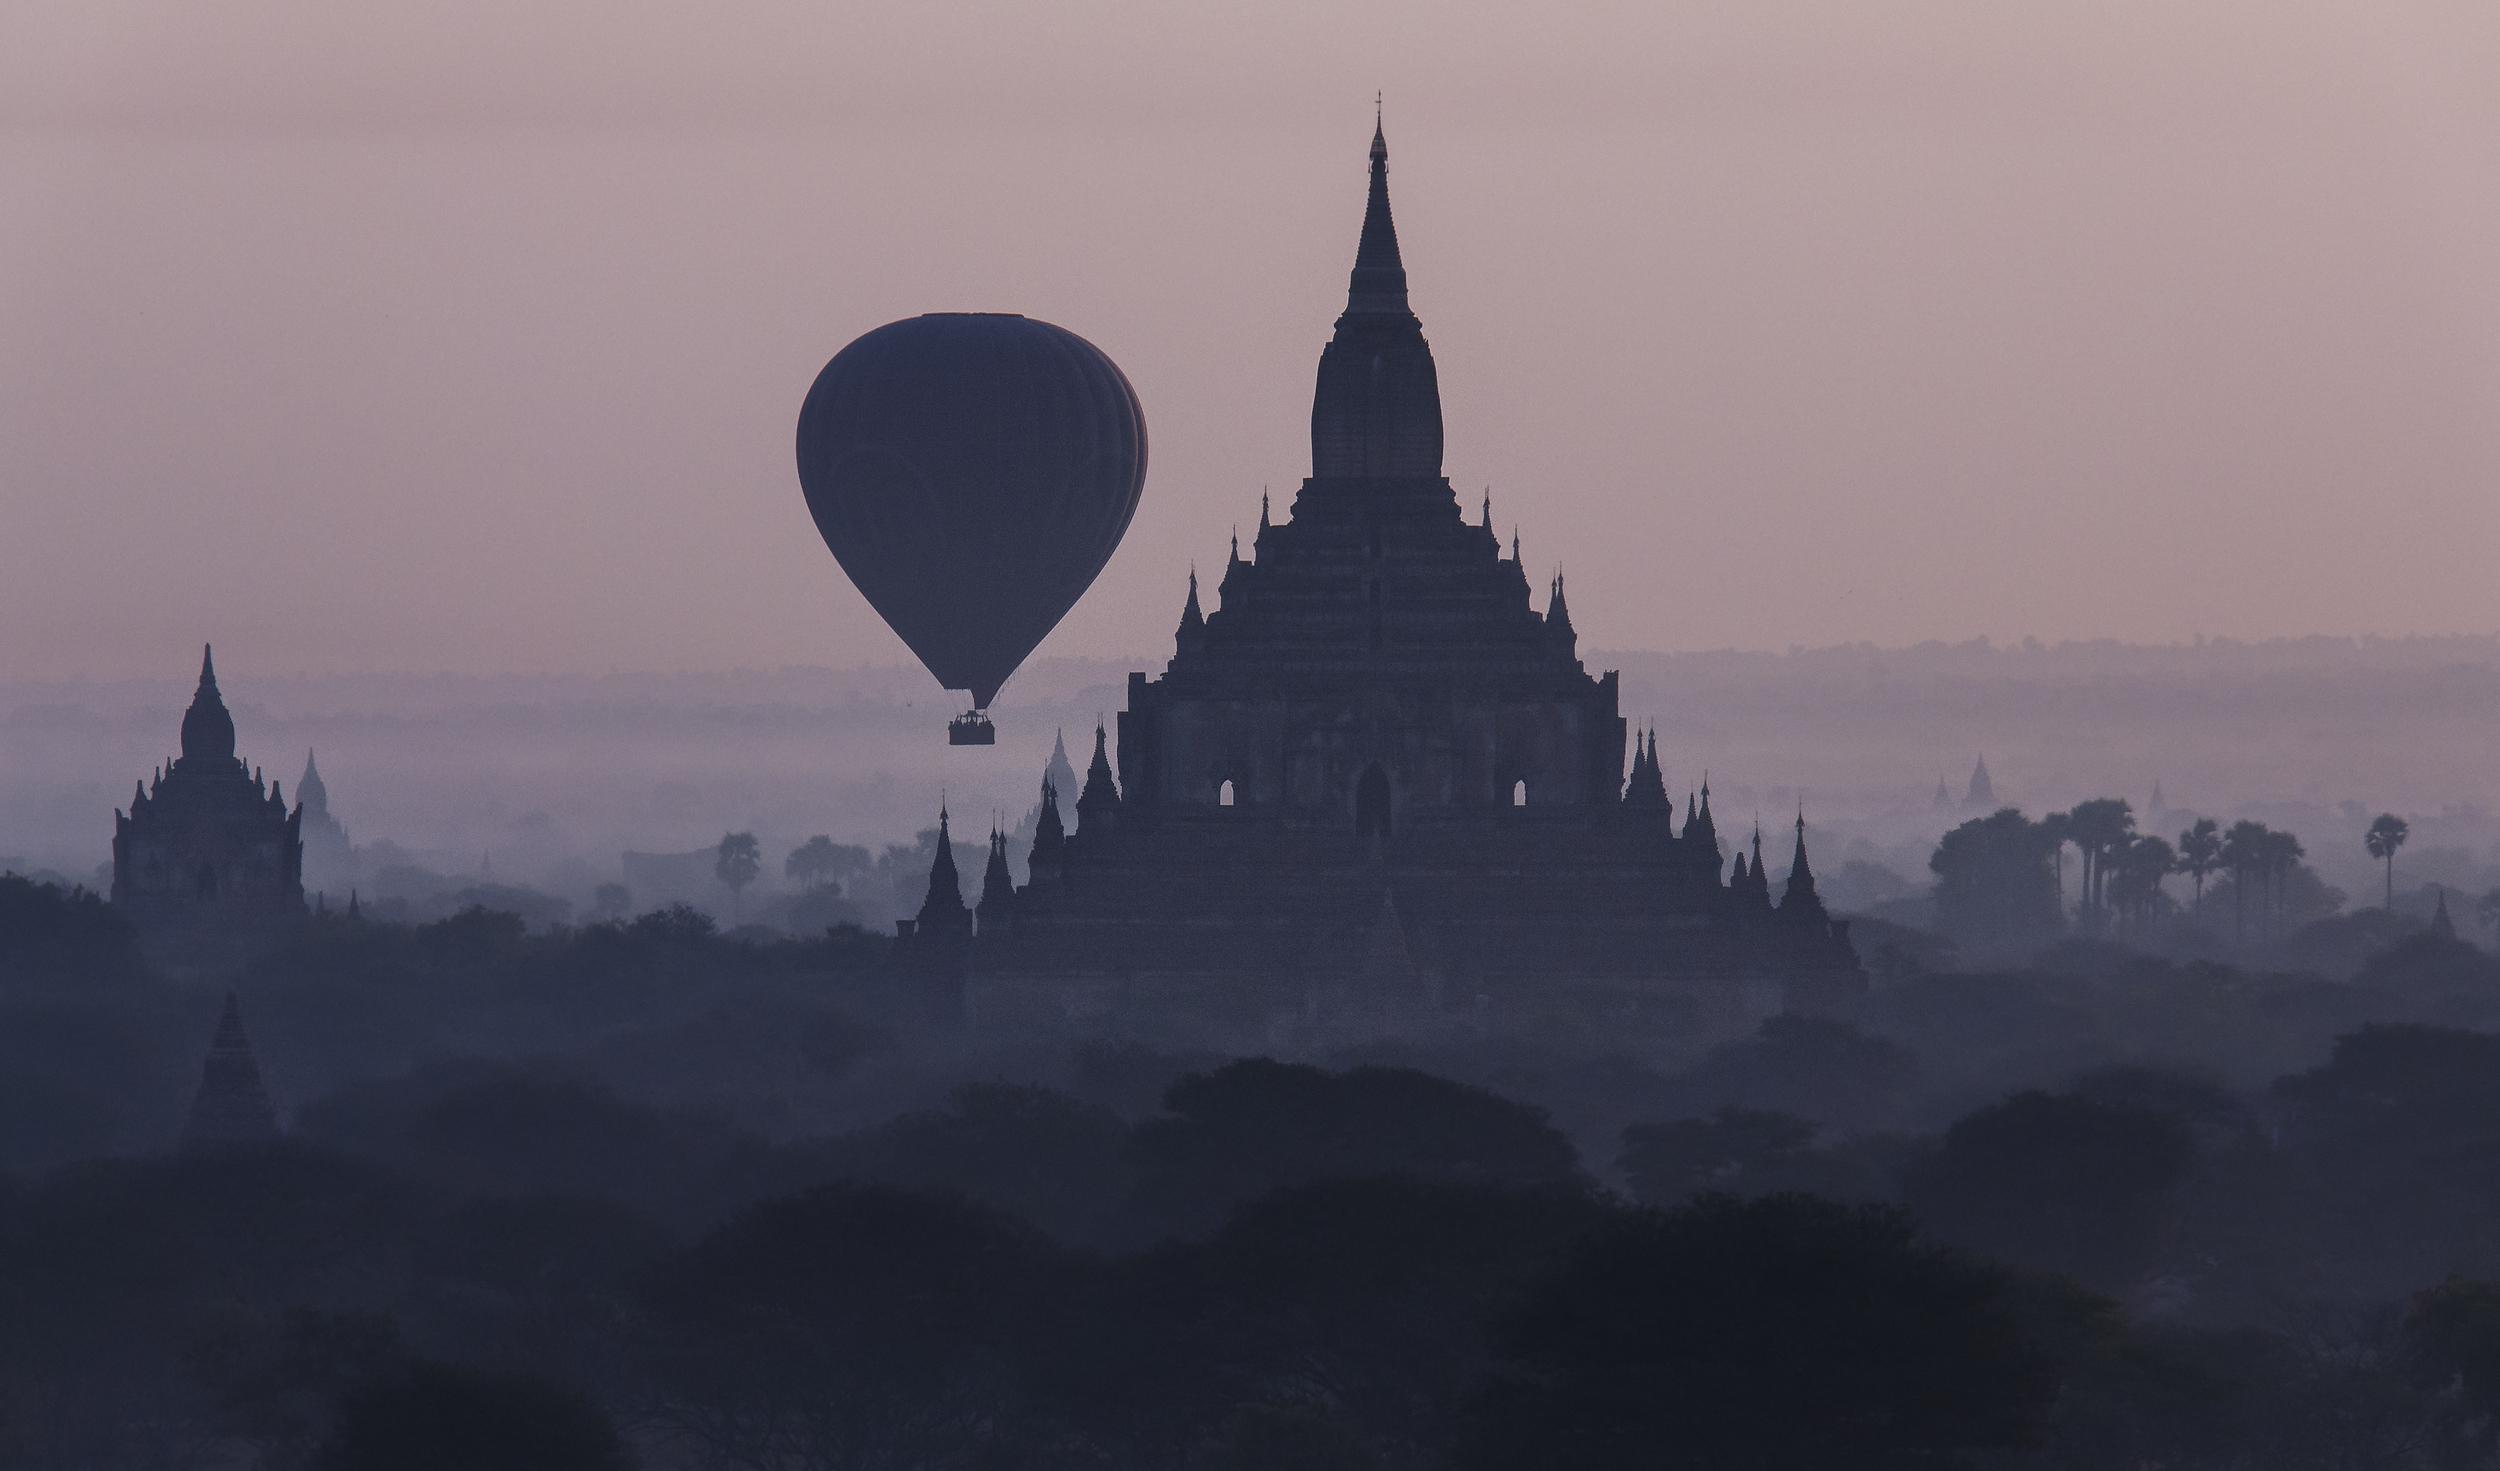 Balloon over Temple.jpg